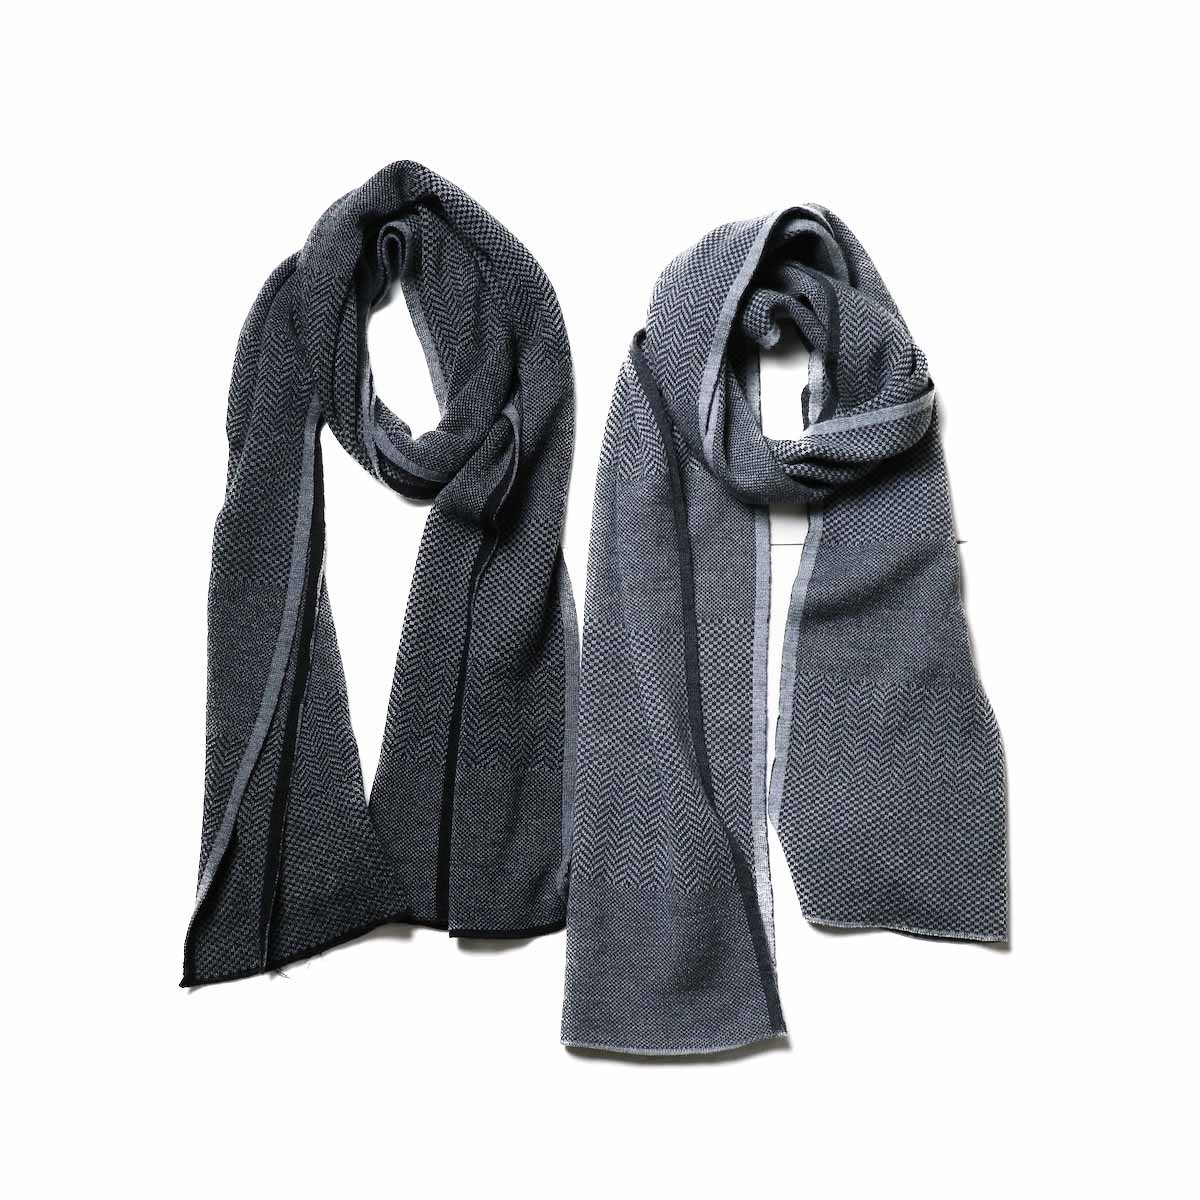 Engineered Garments / Knit Scarf - Wool HB (左:チャコール / 右:グレー)